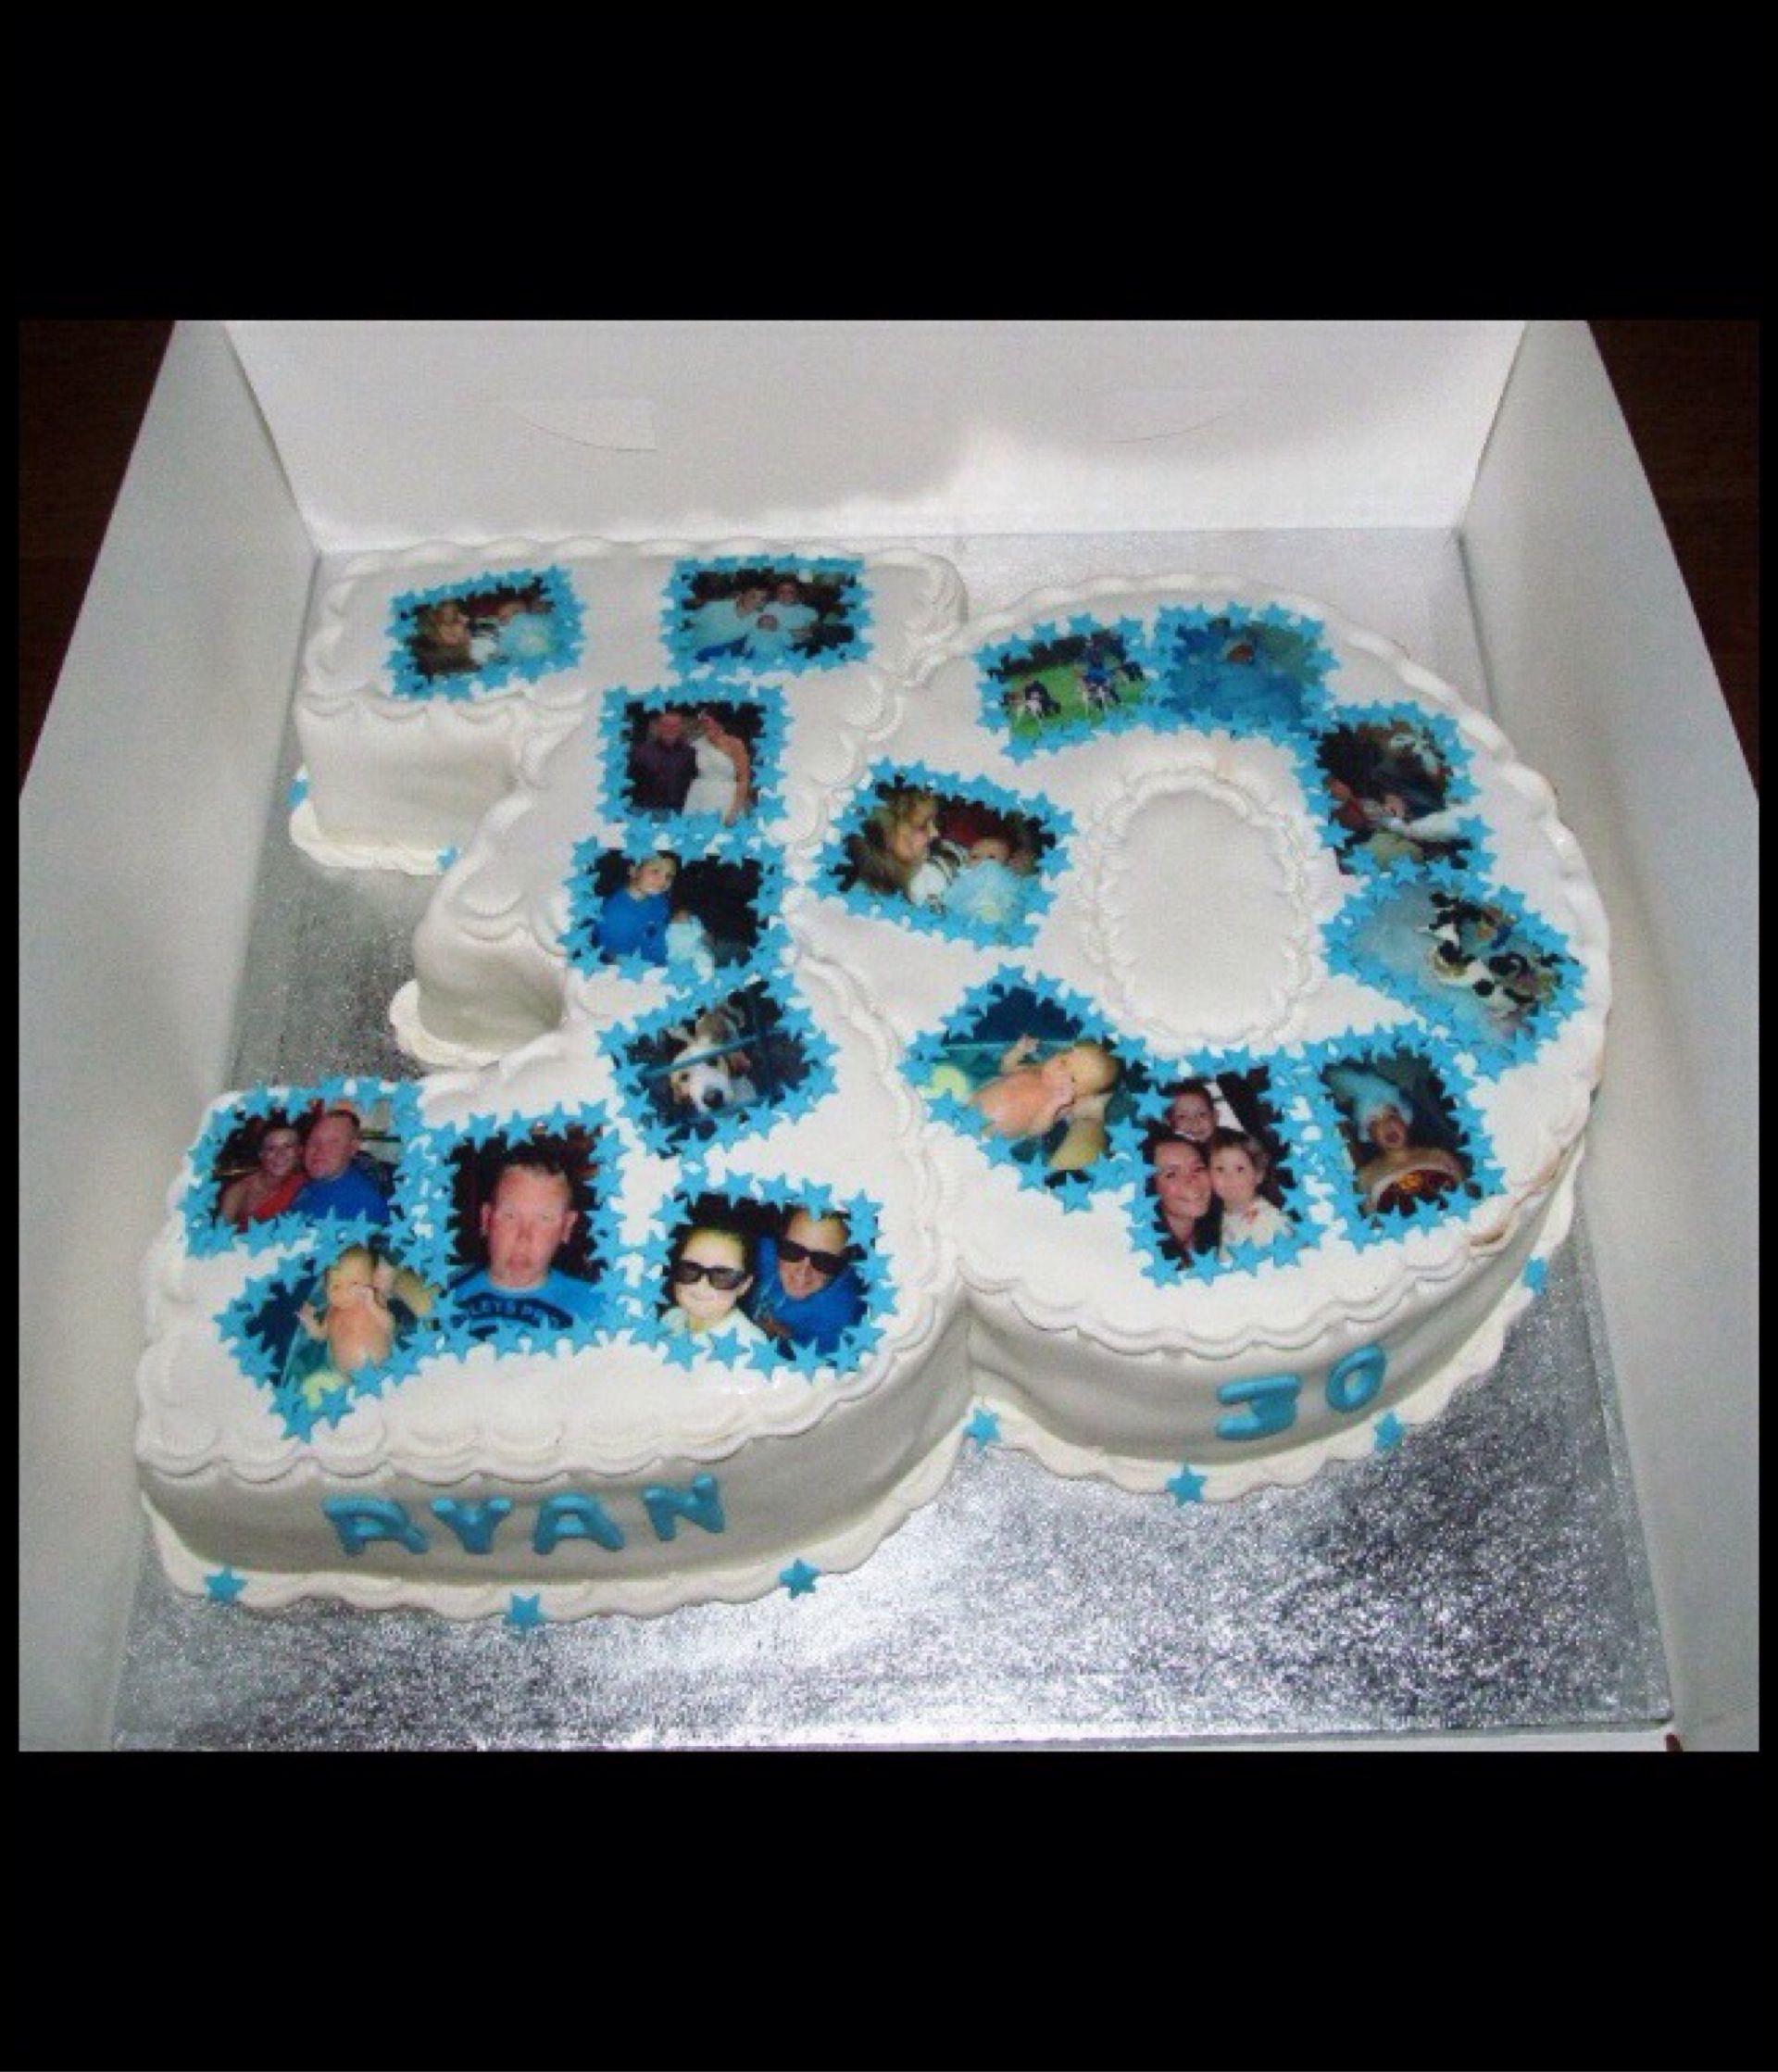 photo cake cake ideas pinterest photos photo cakes and cakes